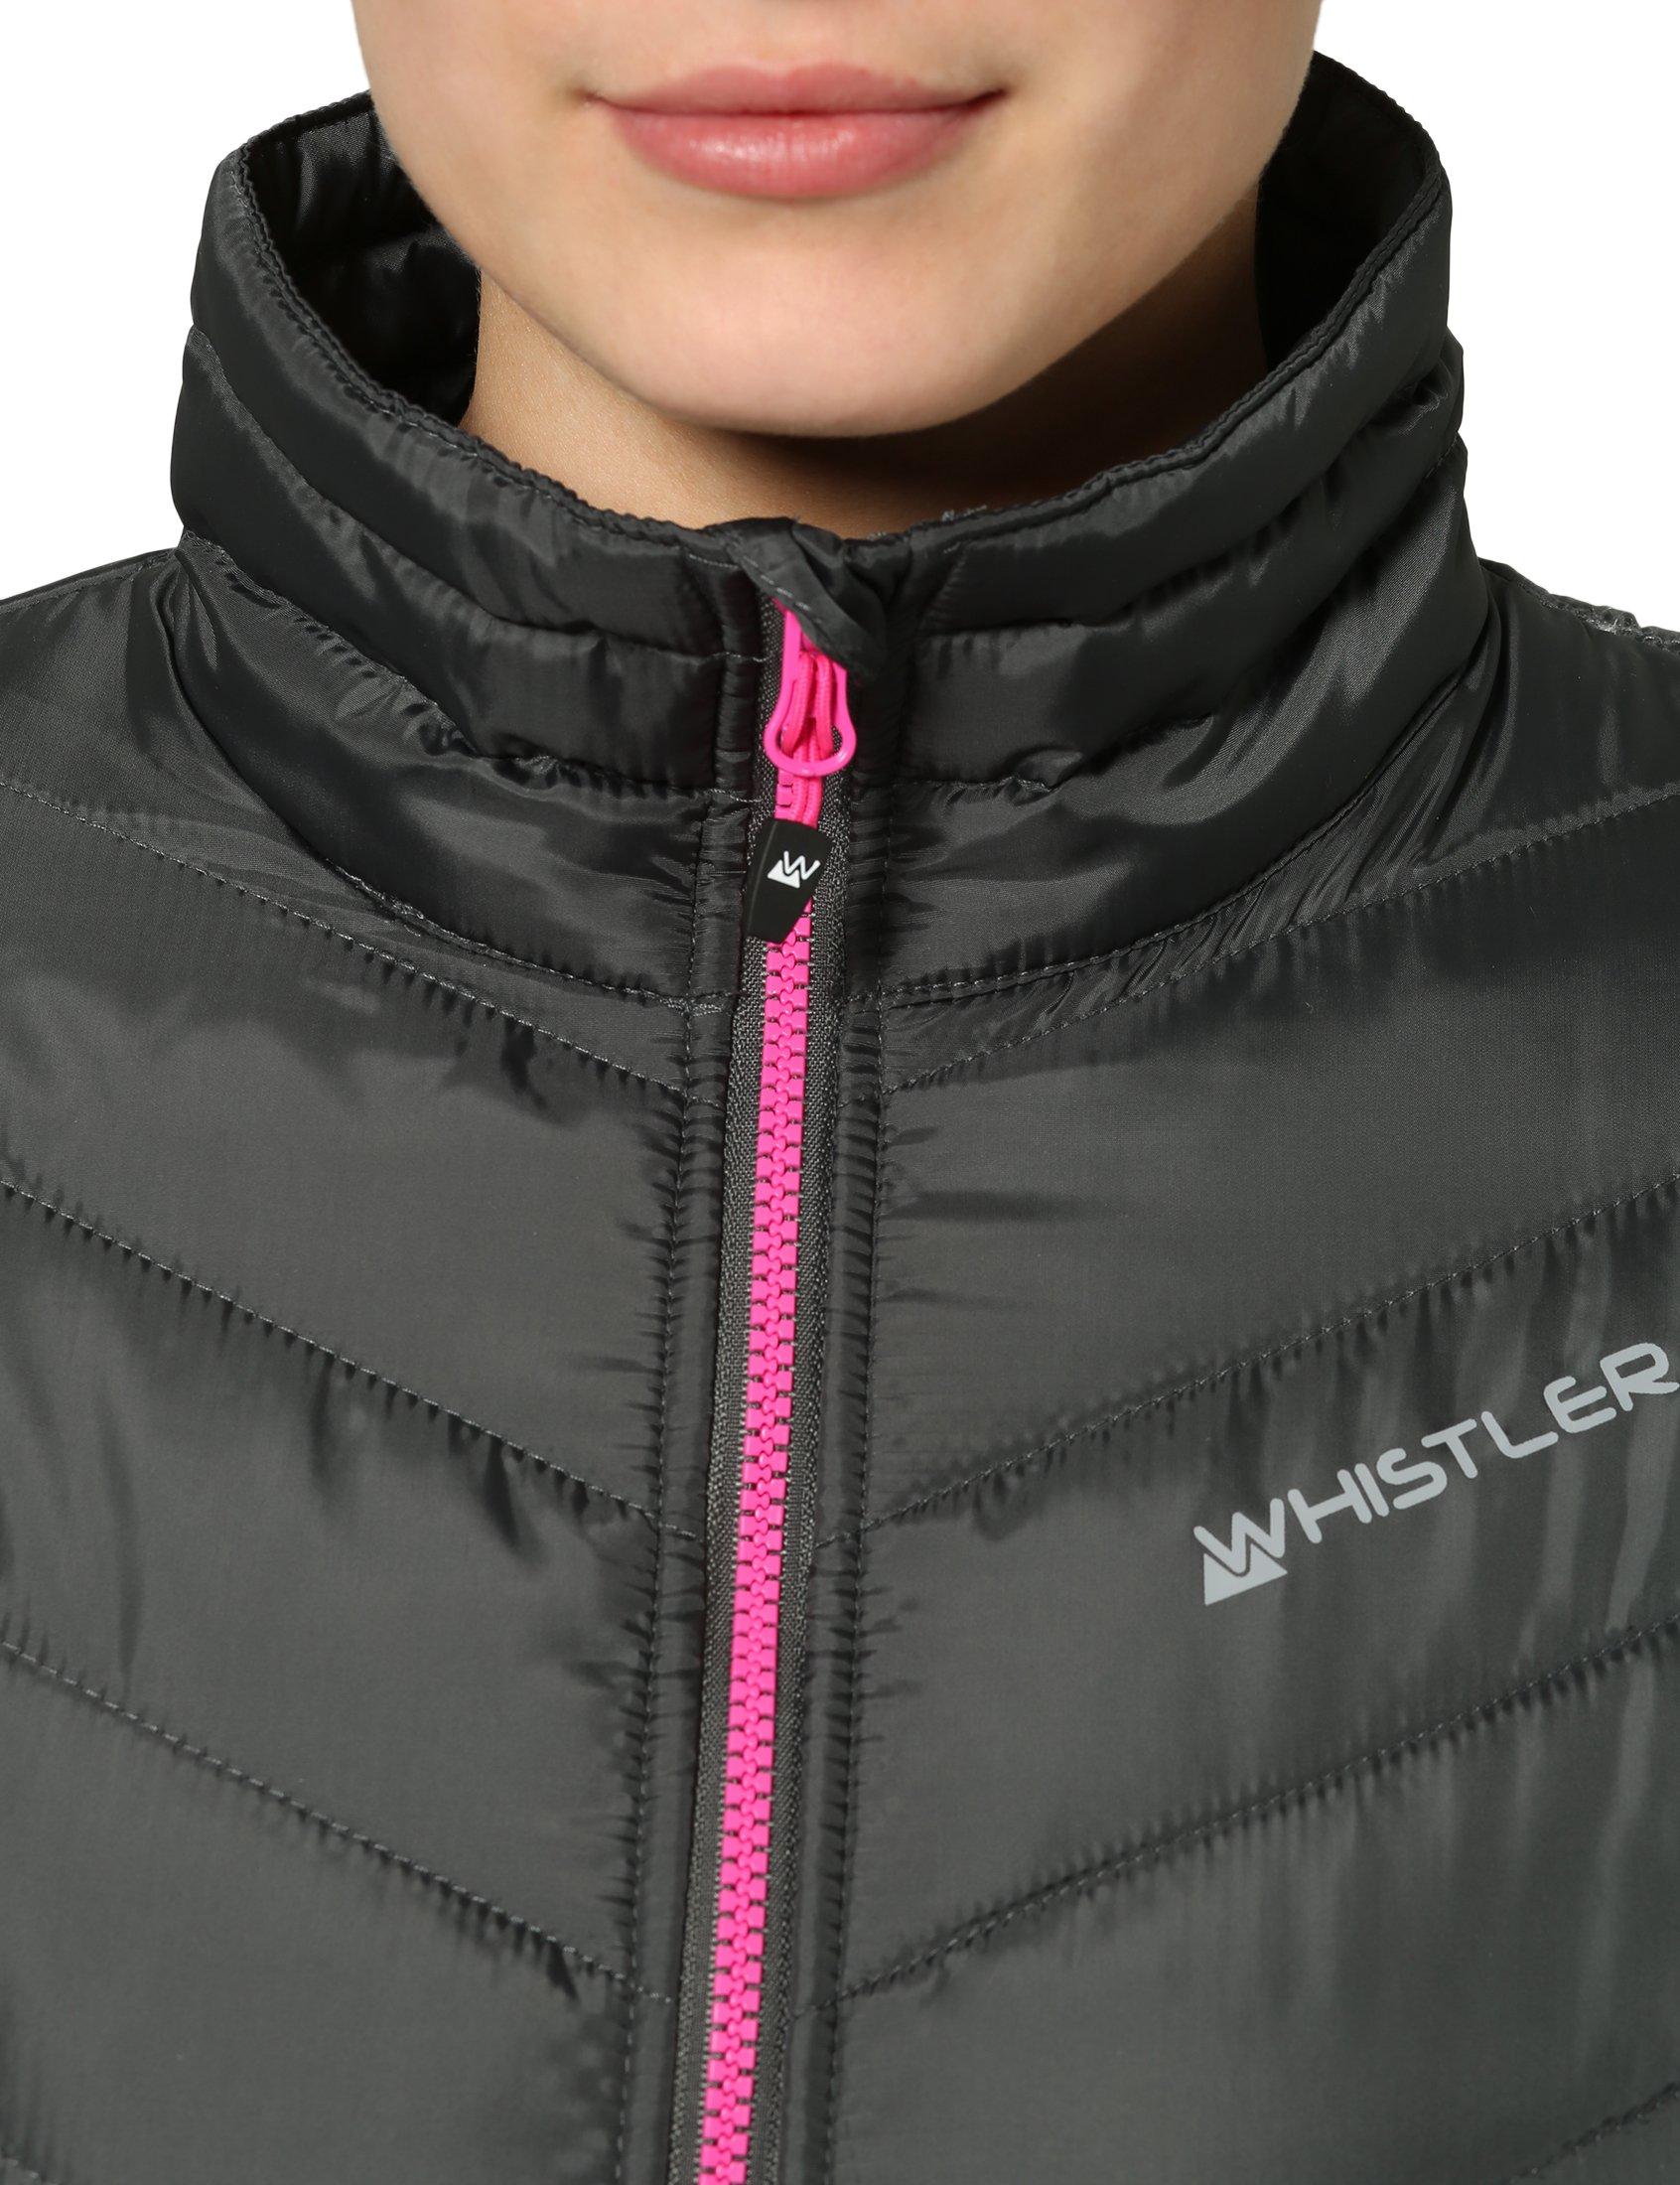 81BPovl34zL - Ultrasport Whistler Women's Quilted Jacket Foggia